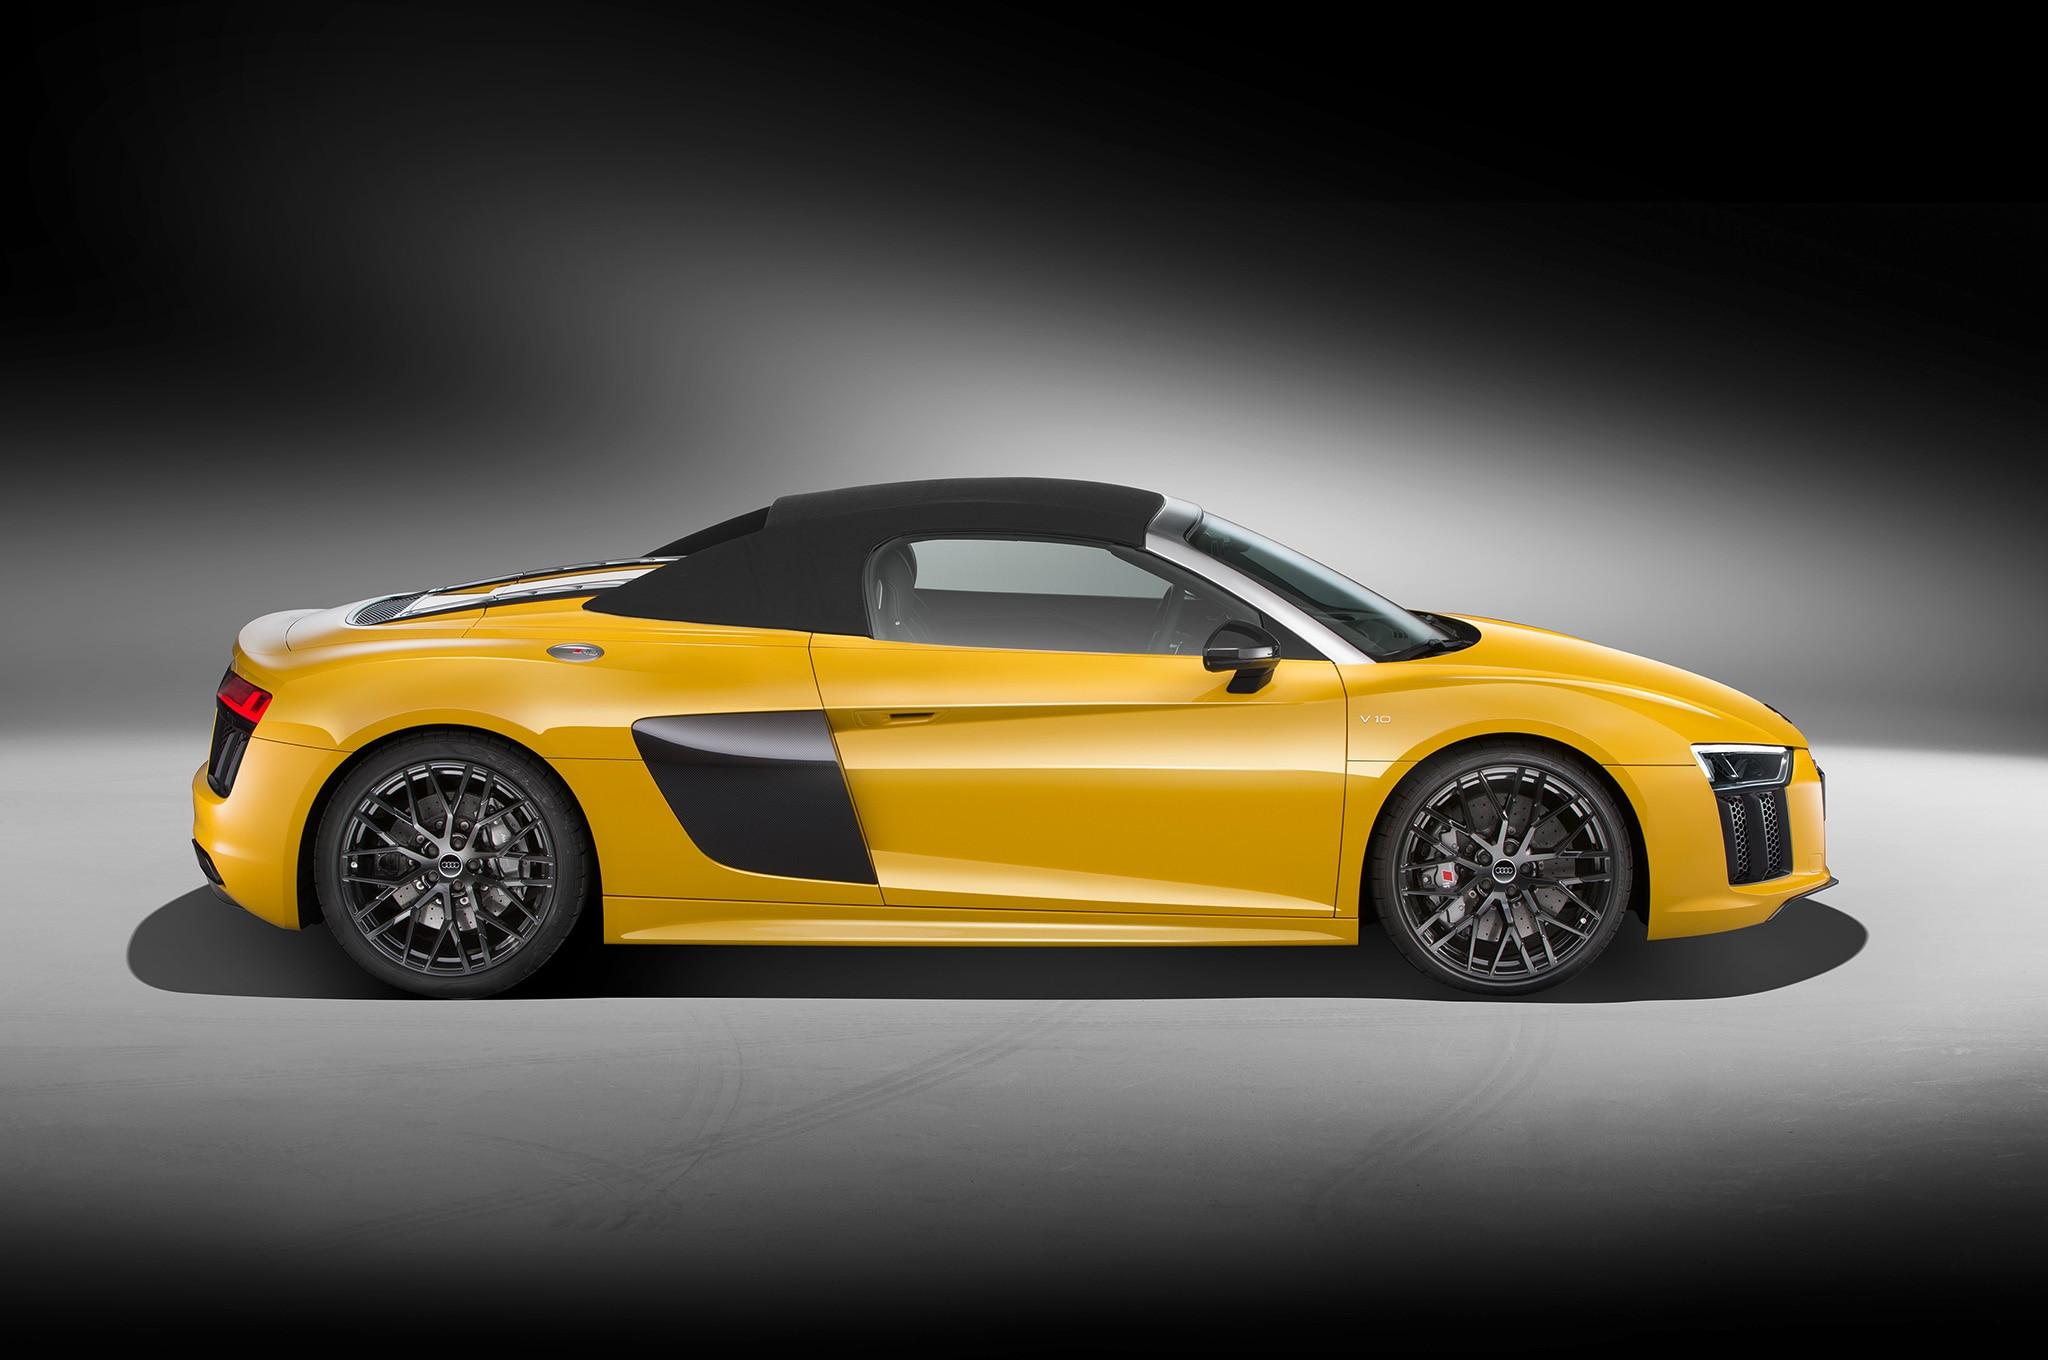 2017 Audi R8 V10 Spyder One Week Review Automobile Magazine